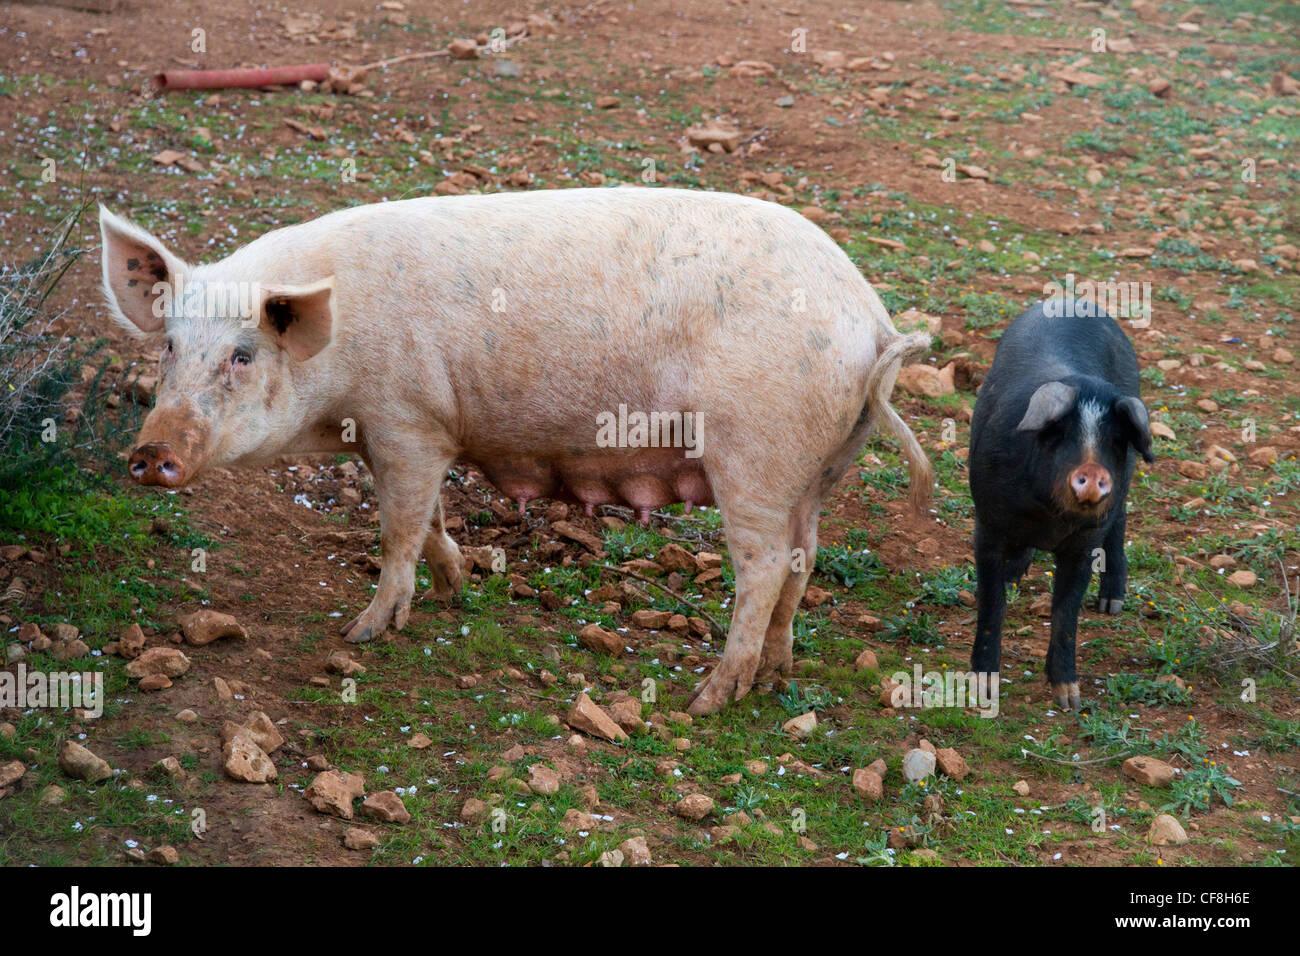 pig and piglets hiberian Majorcan Mallorca Spain - Stock Image